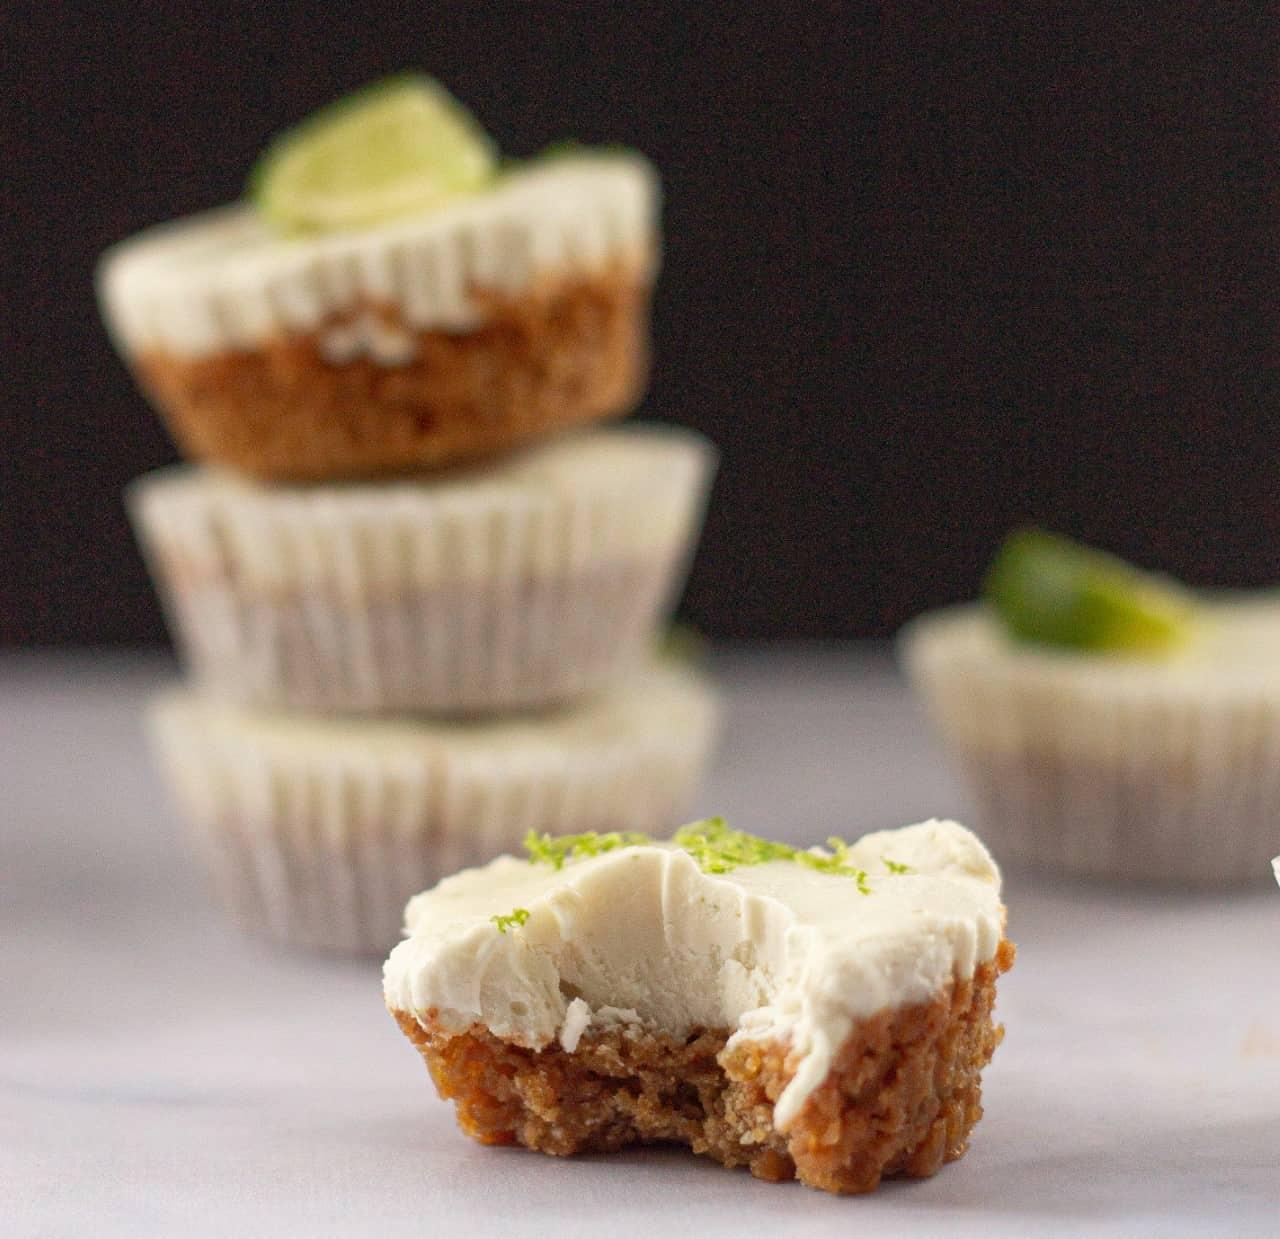 No Bake Vegan Key Lime Pie Recipe is the Perfect Dessert